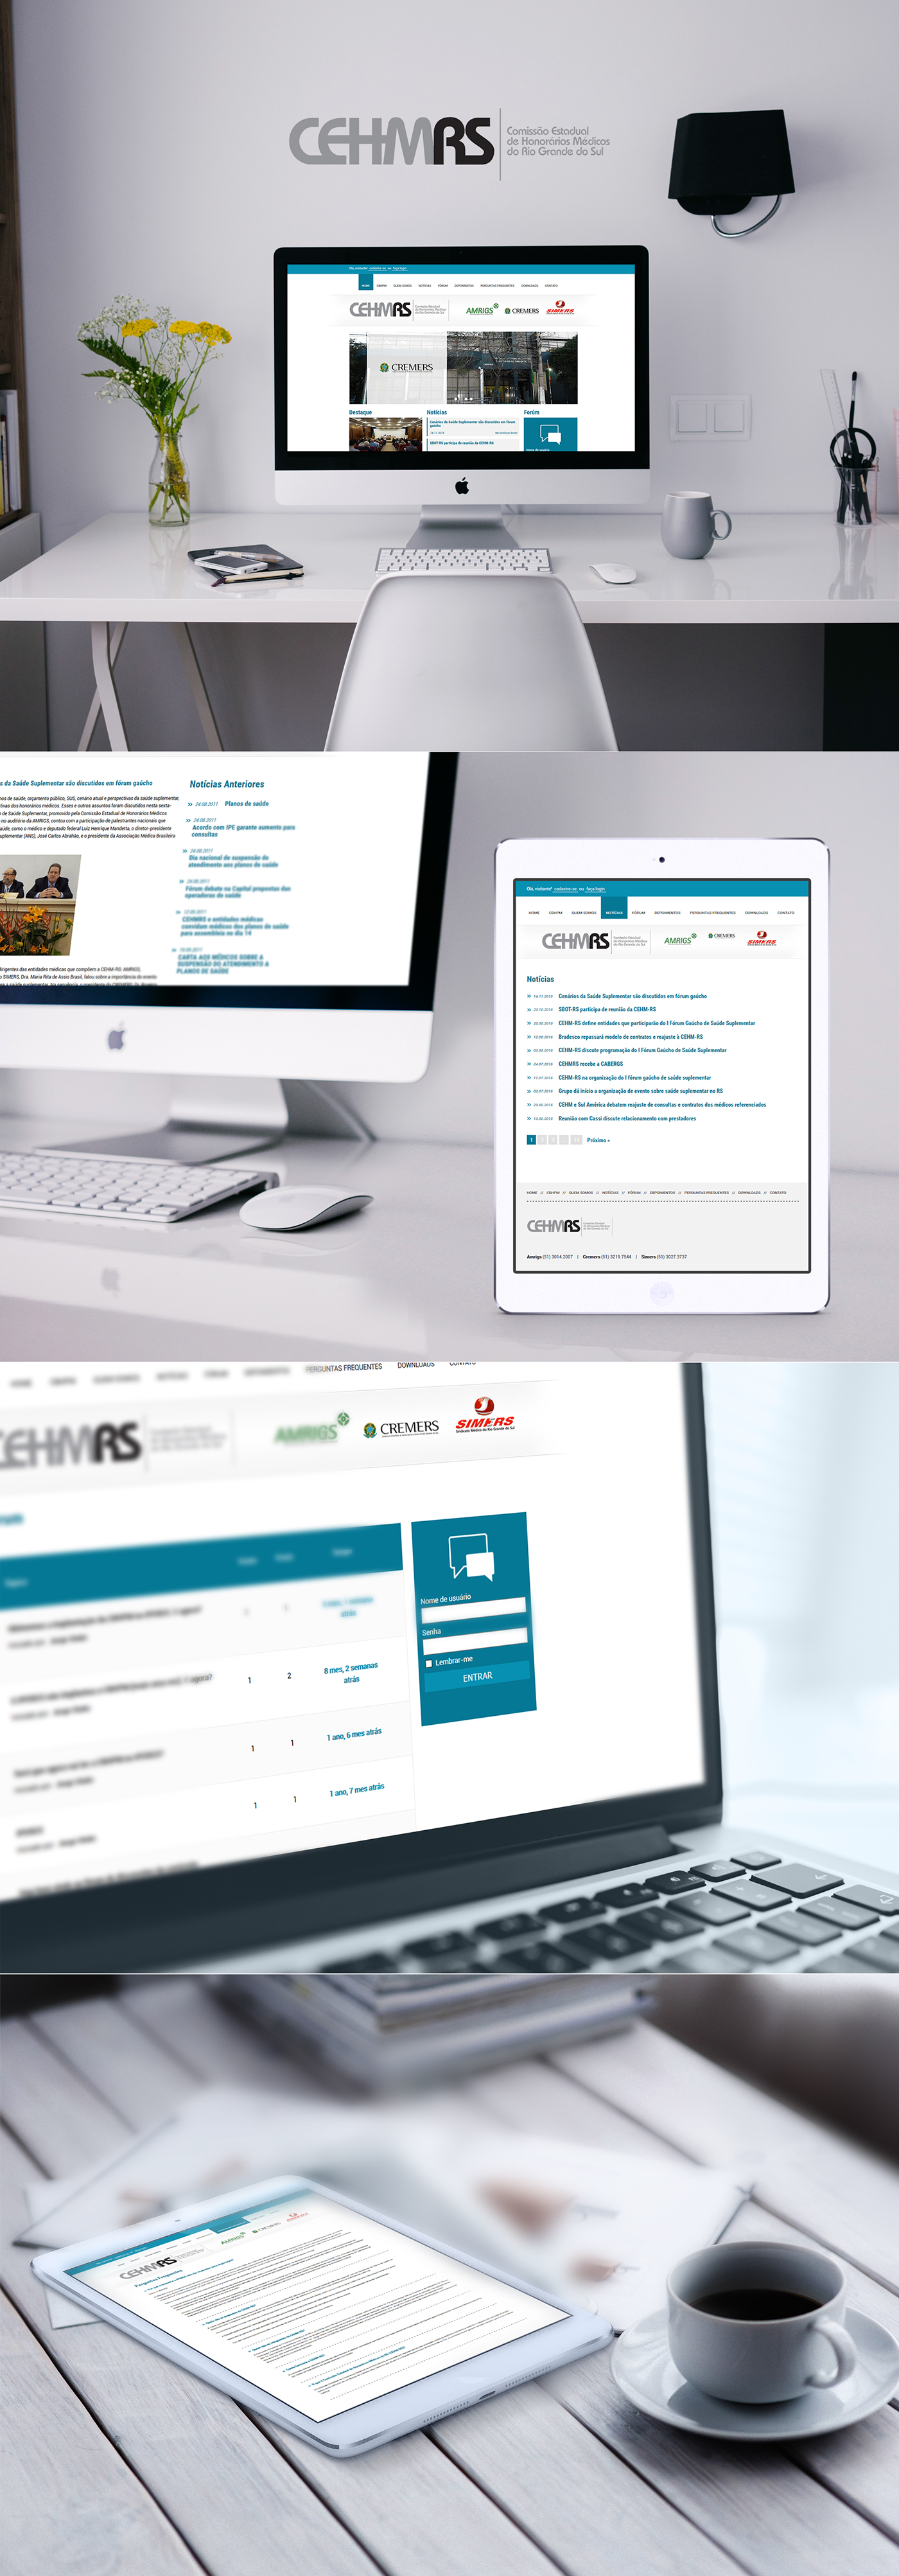 comissao médicos interatividade forum Website Interface